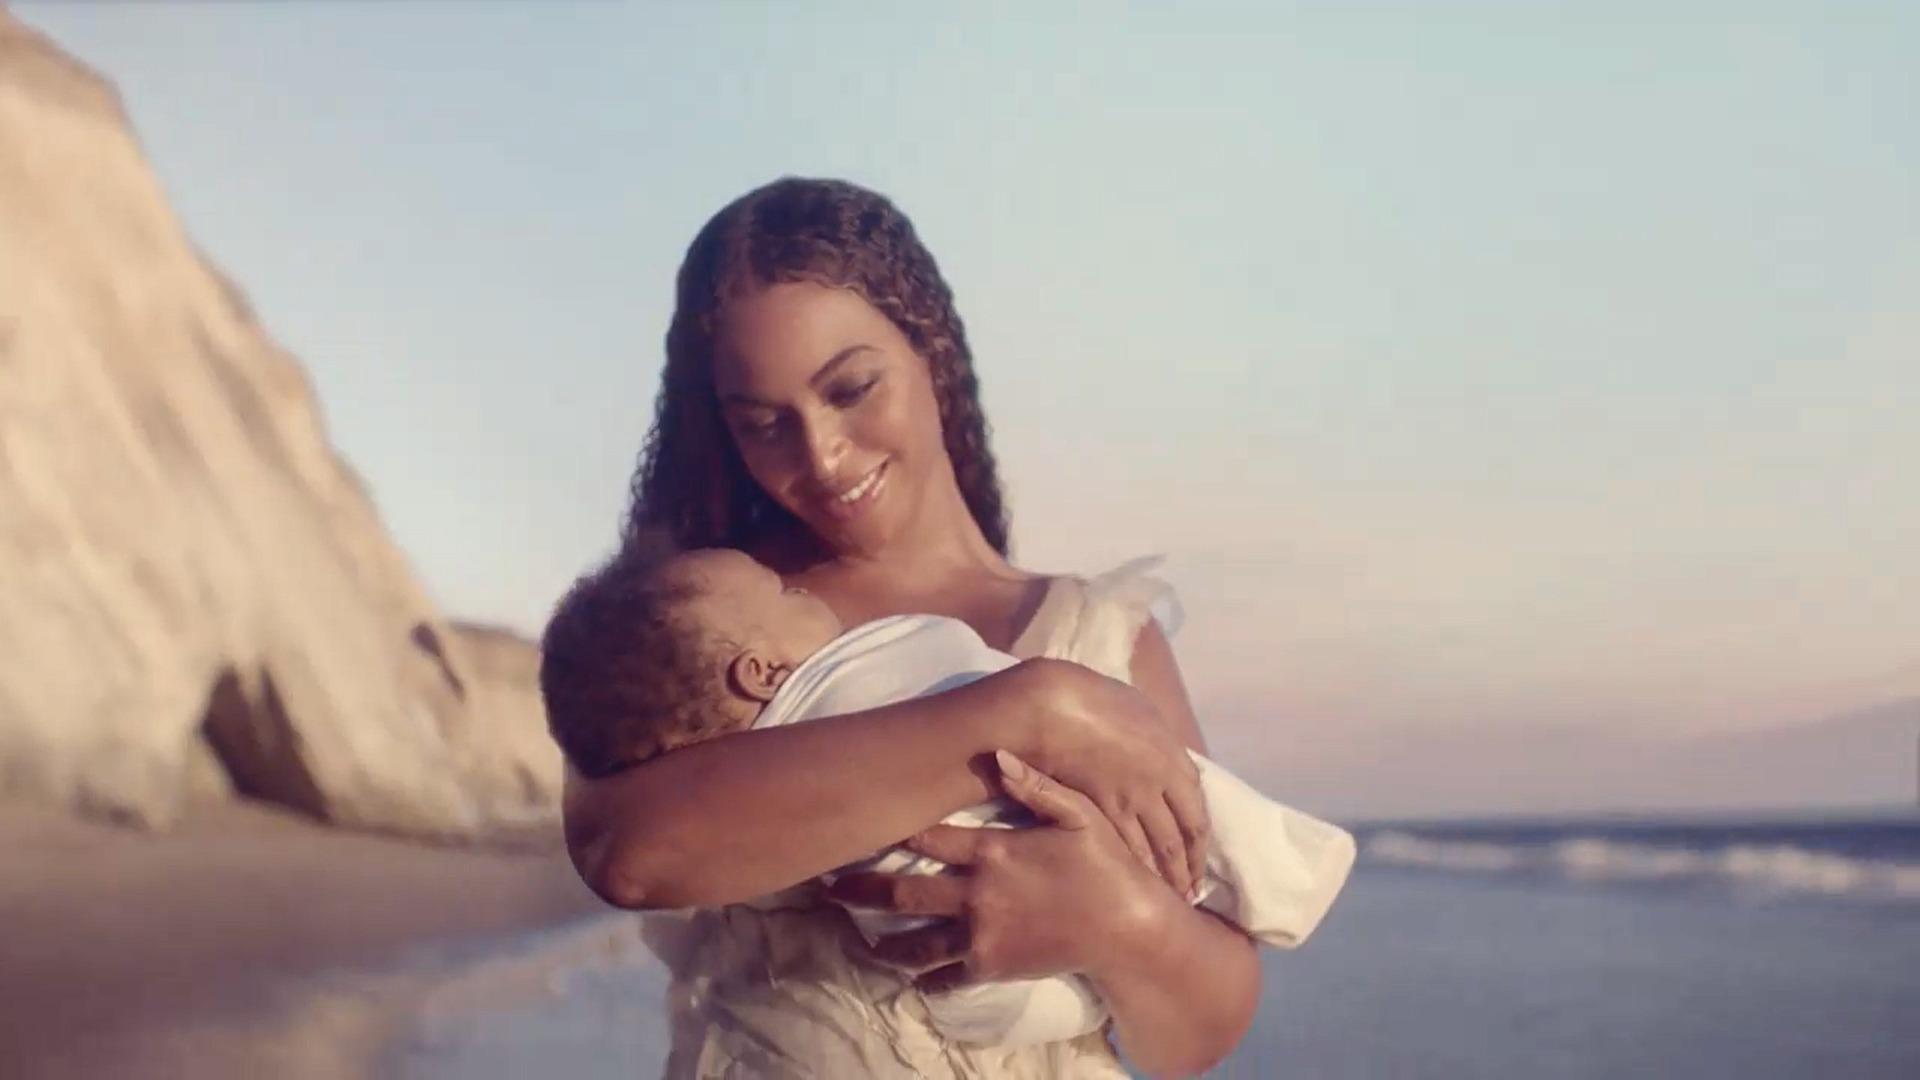 Beyoncé divulga trailer incrível do álbum visual 'Black Is King'